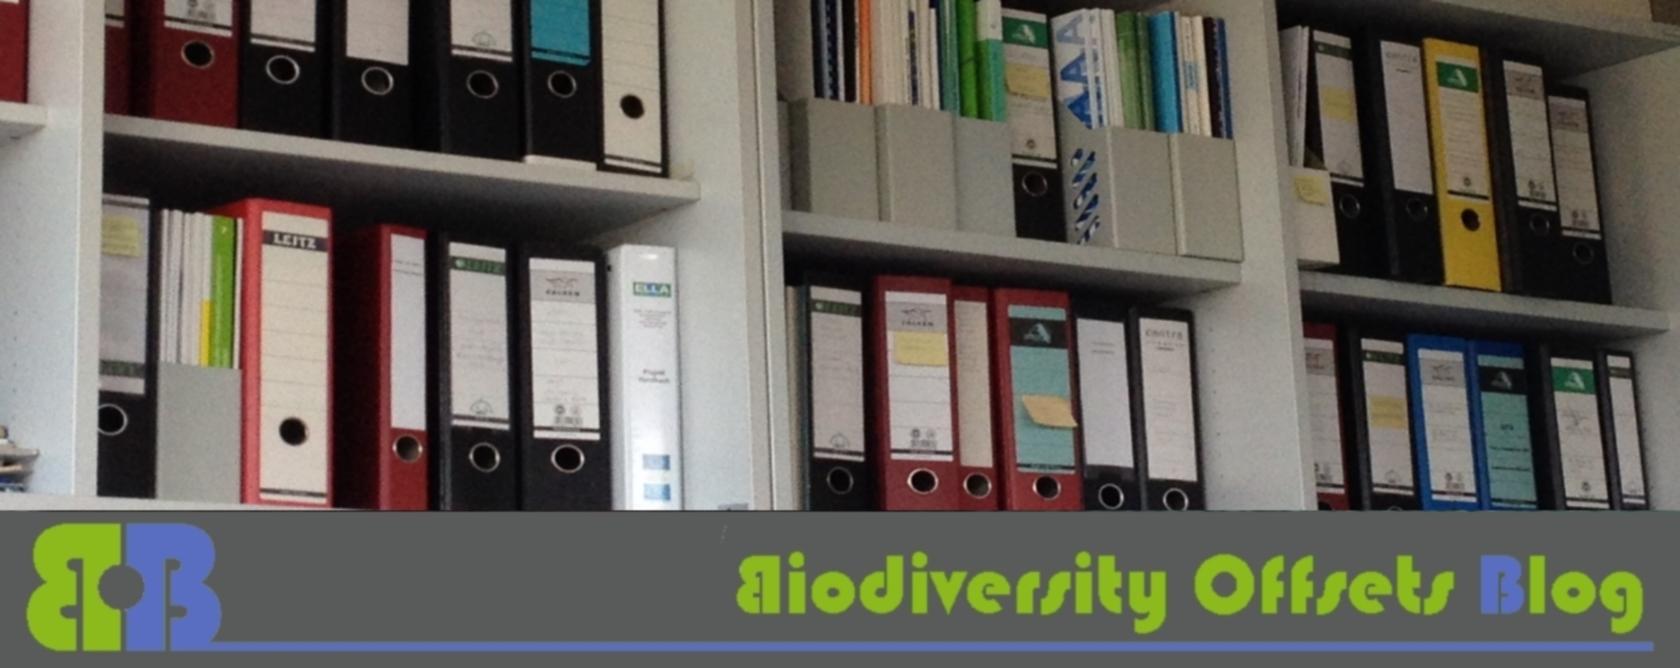 Biodiversity Offsets Blog Logo_hellgruen_sources_1680